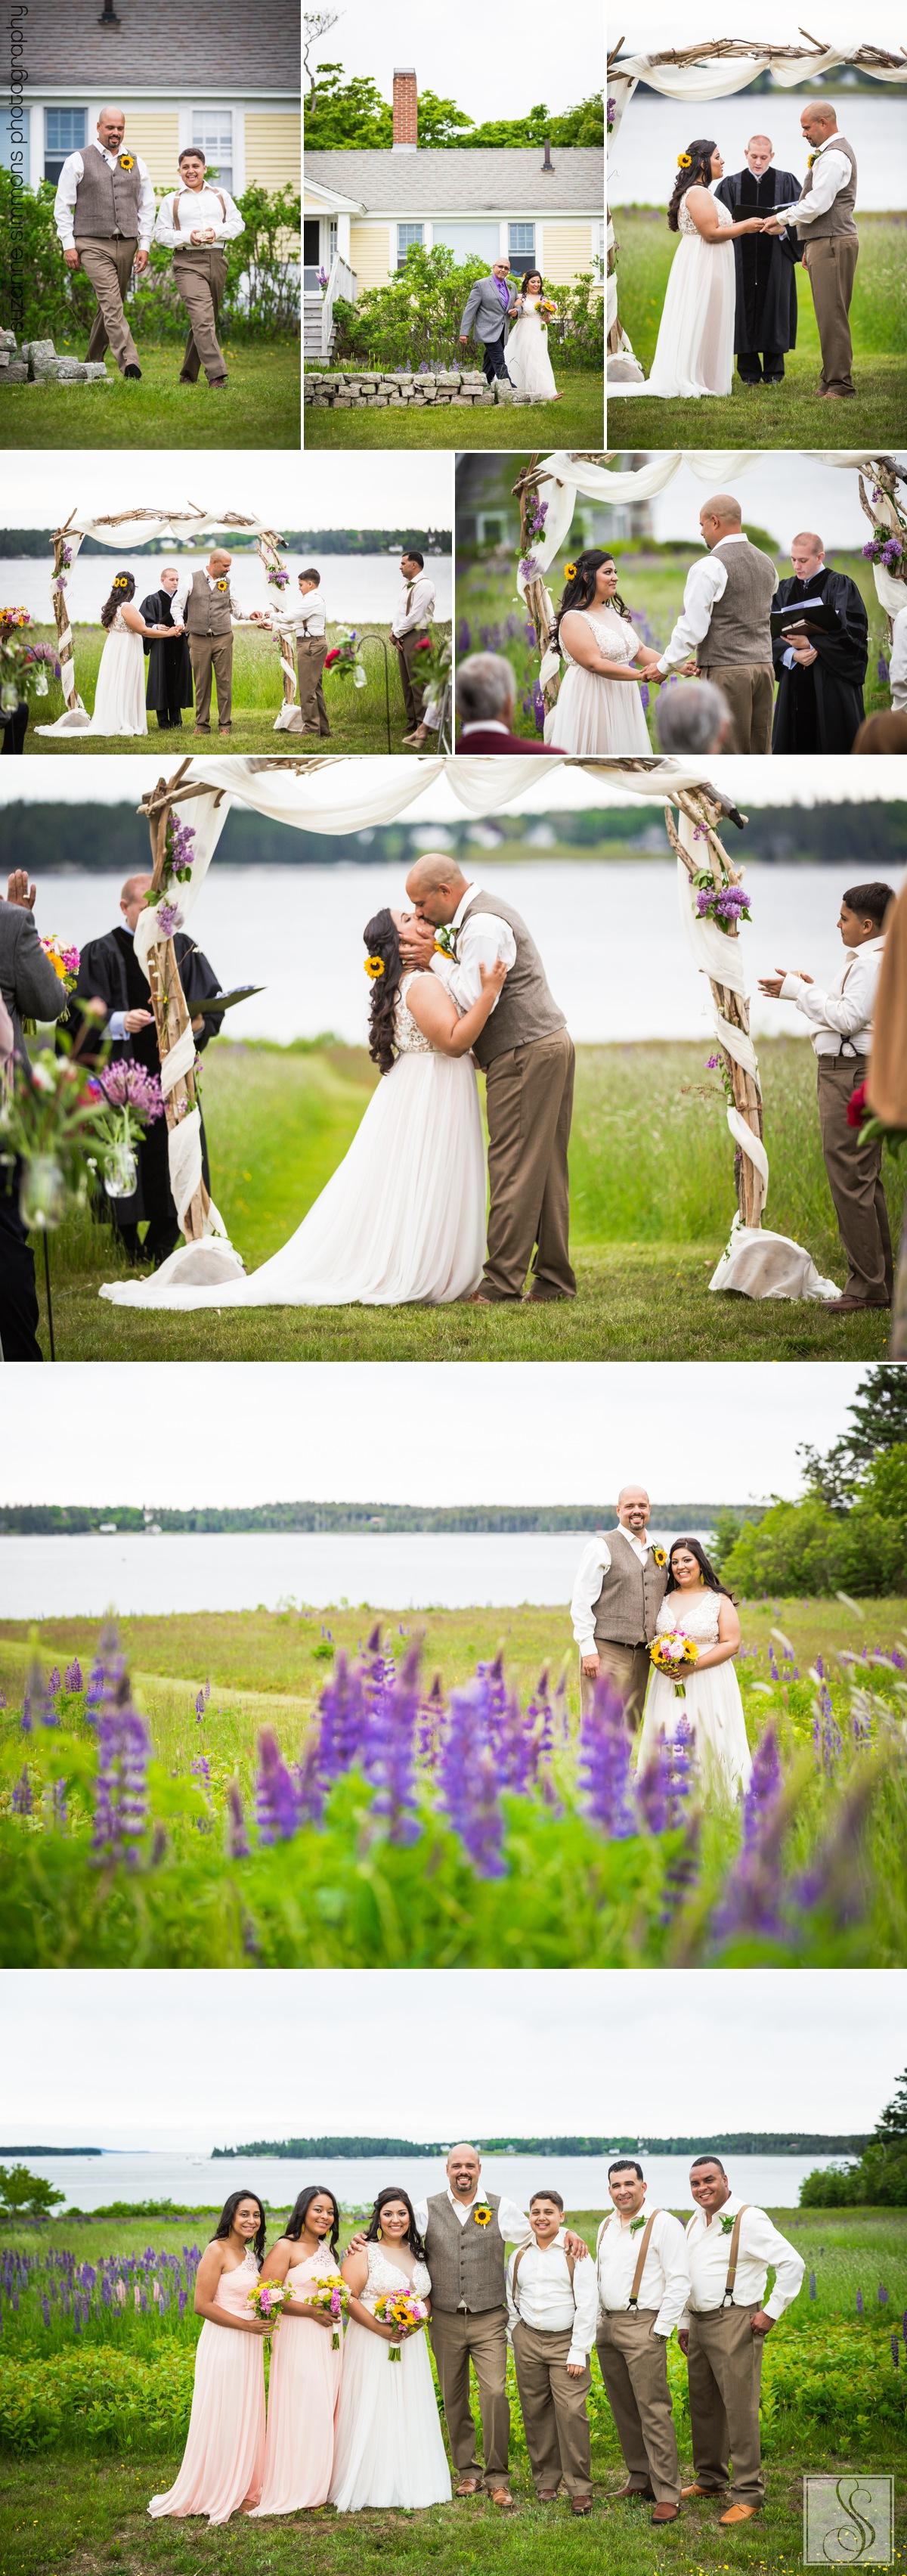 Lupine wedding in Southwest Harbor, Maine